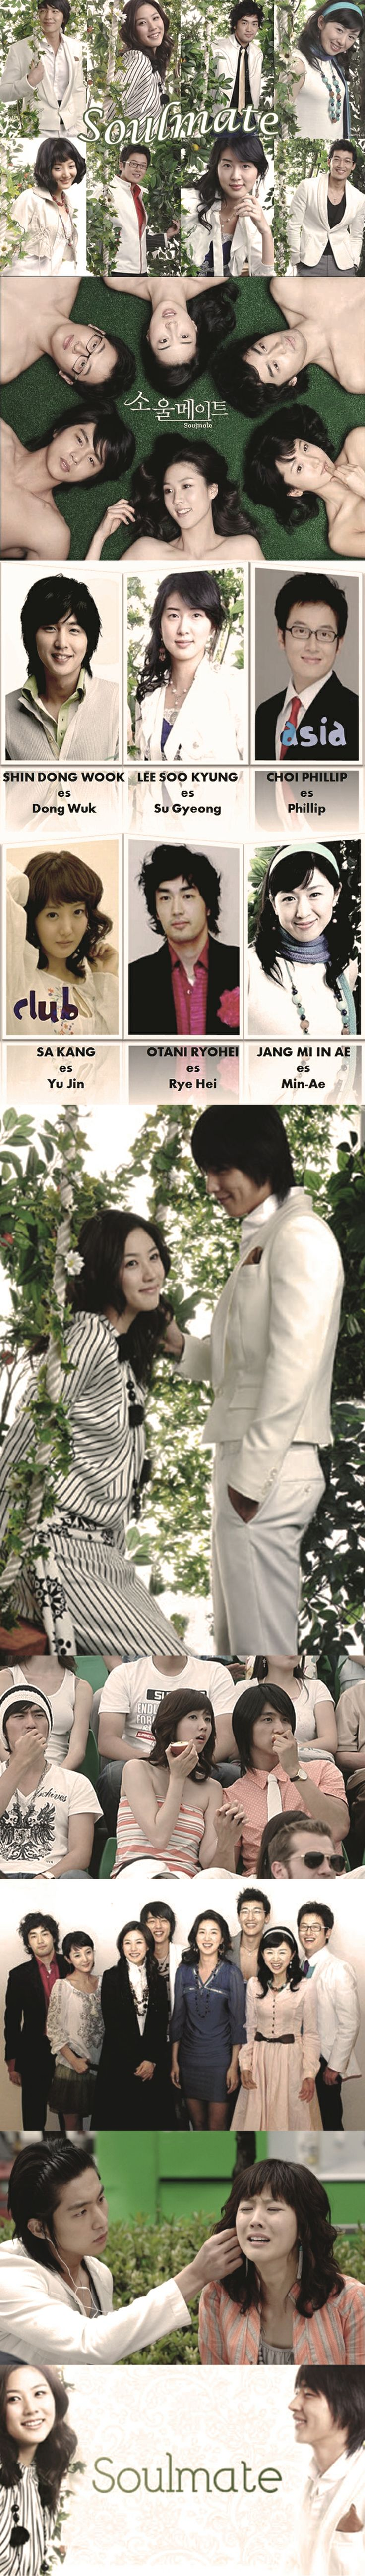 Soulmate (소울메이트) - Kdrama 2006 - 22 episodes - Shin Dong Wook / Lee Soo Kyung / Choi Phillip / Sa Kang / Otani Ryohei / Jang Mi In Ae